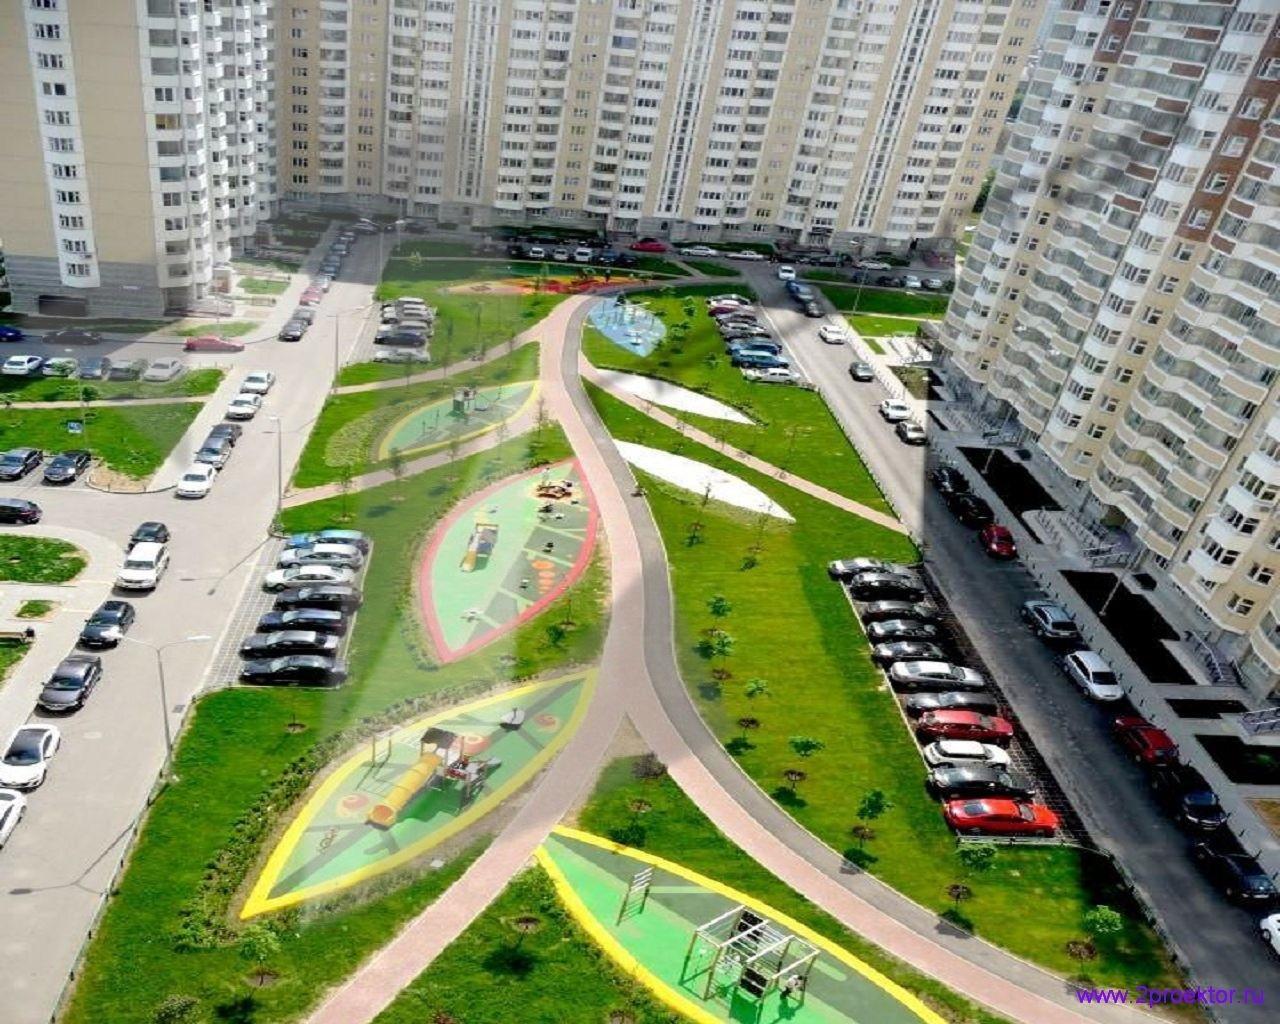 Ландшафт в Жилом комплексе Головино.